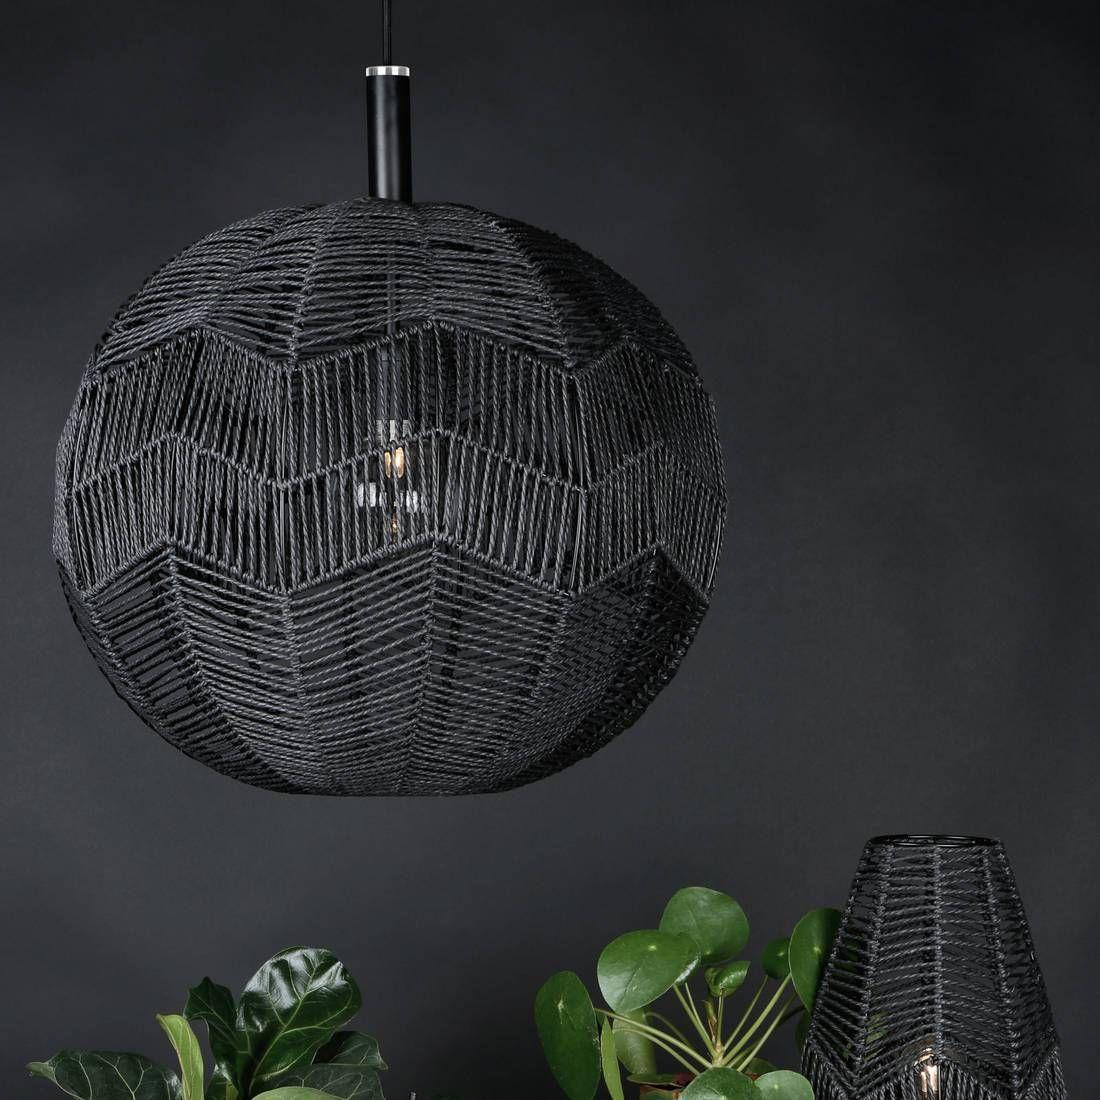 Suspension Rotin Noir ˜45cm MISSY Suspension Globen Lighting Anna